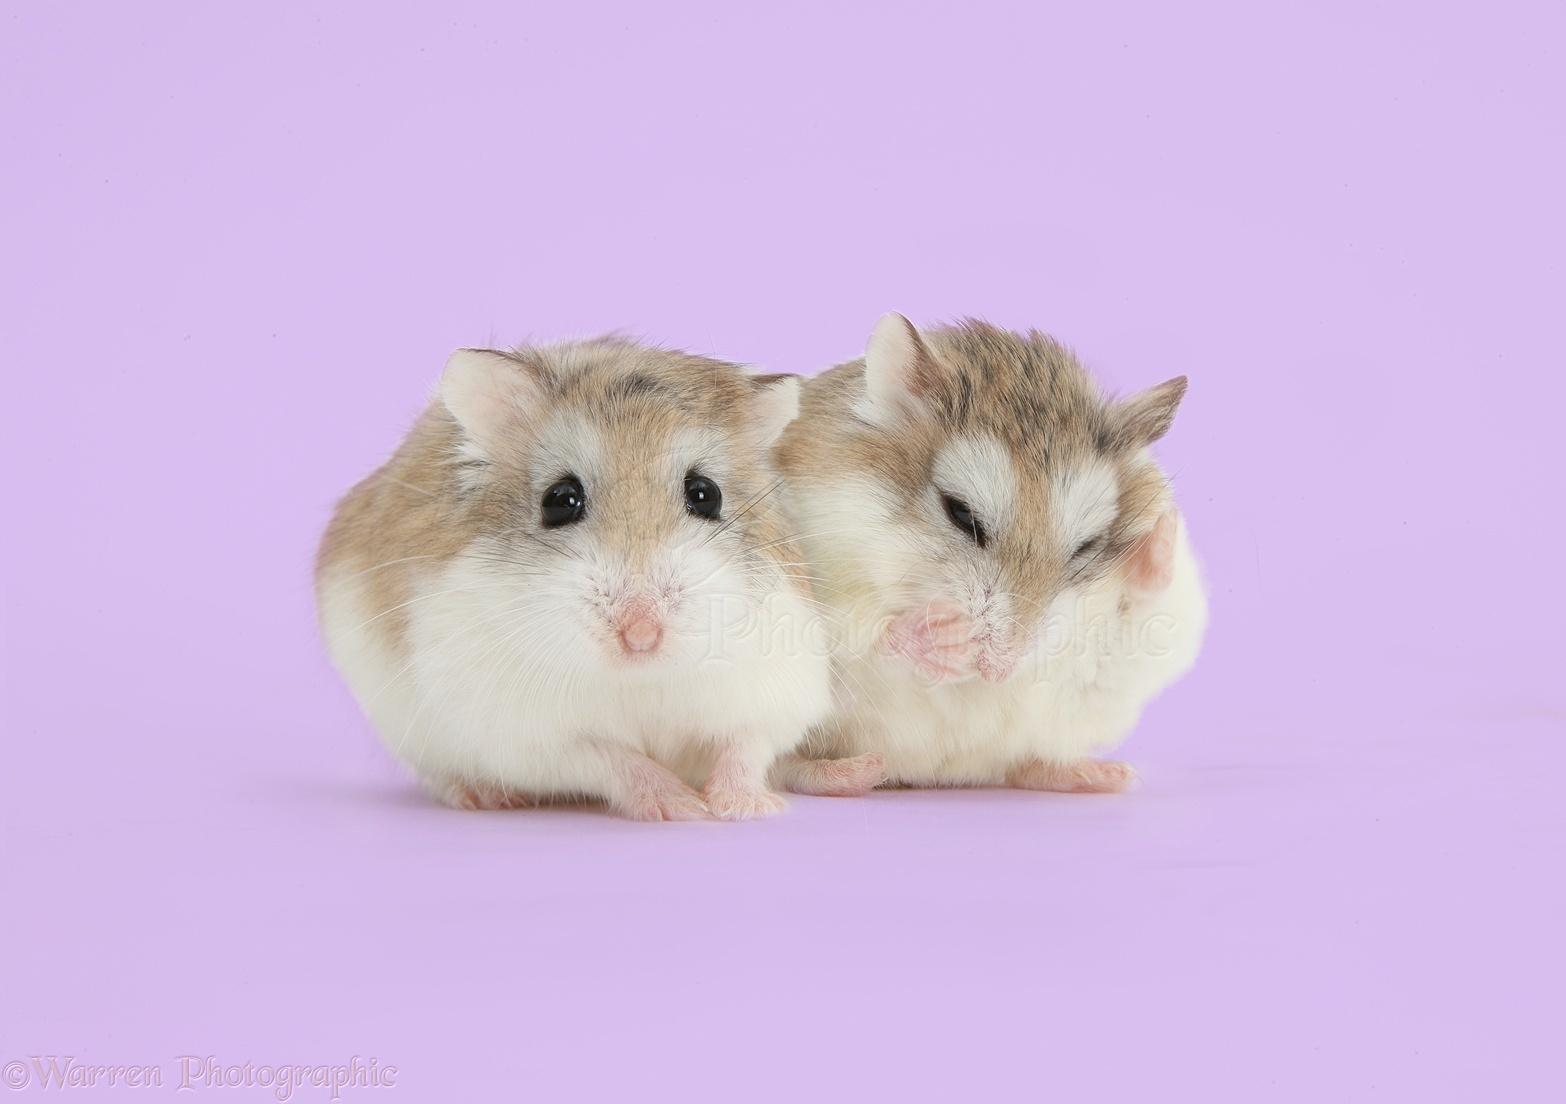 Roborovski Hamsters on lilac background photo WP41627 1566x1104